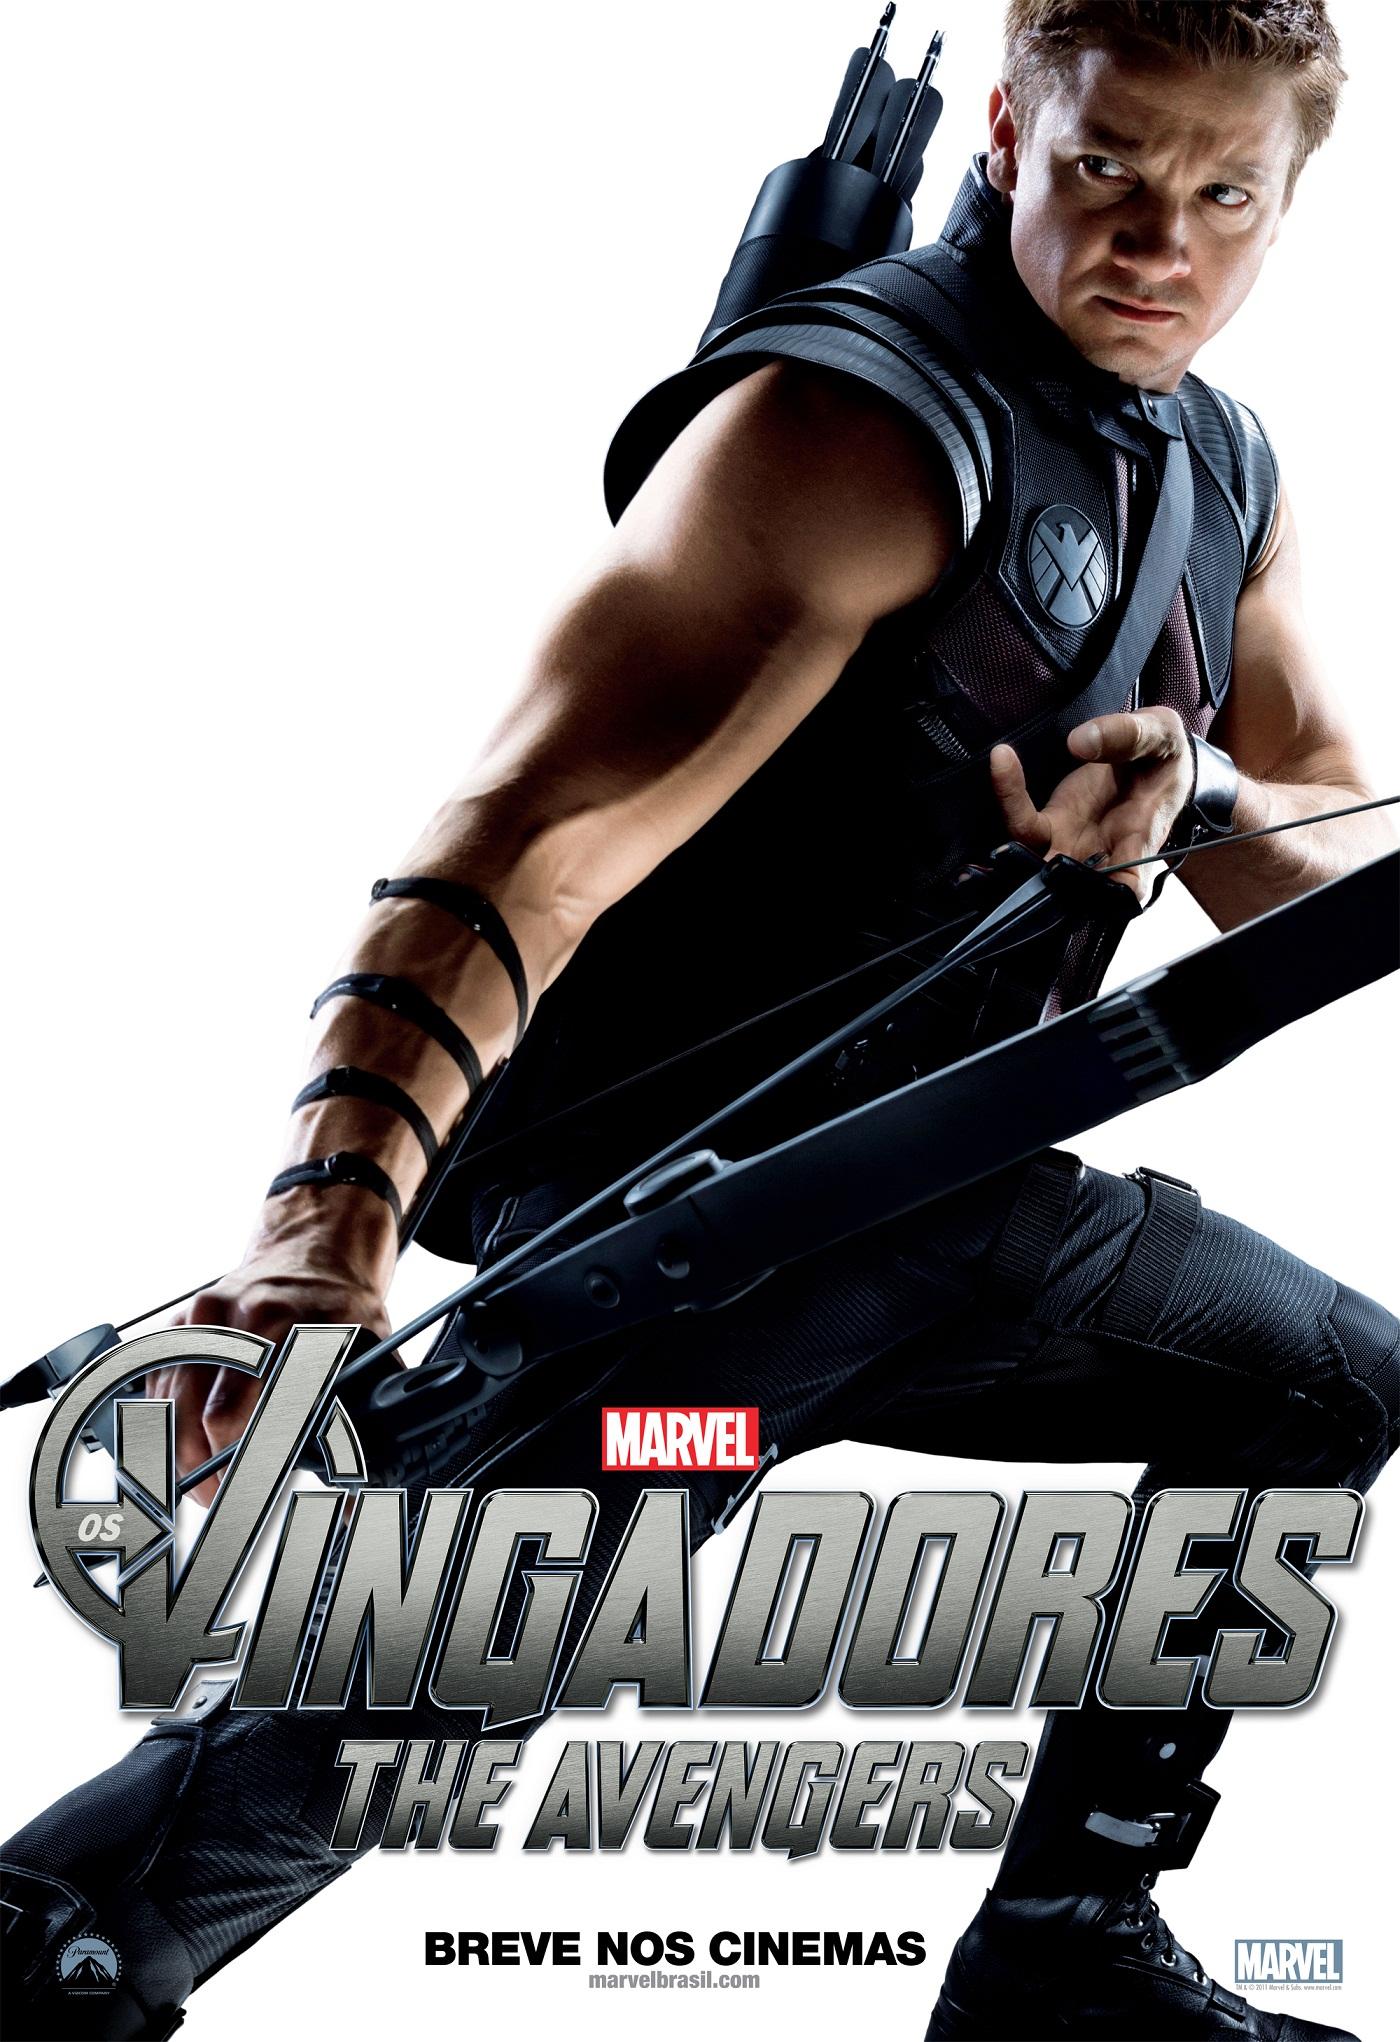 The Avengers: Cartazes Nacionais De 'Os Vingadores: The Avengers'